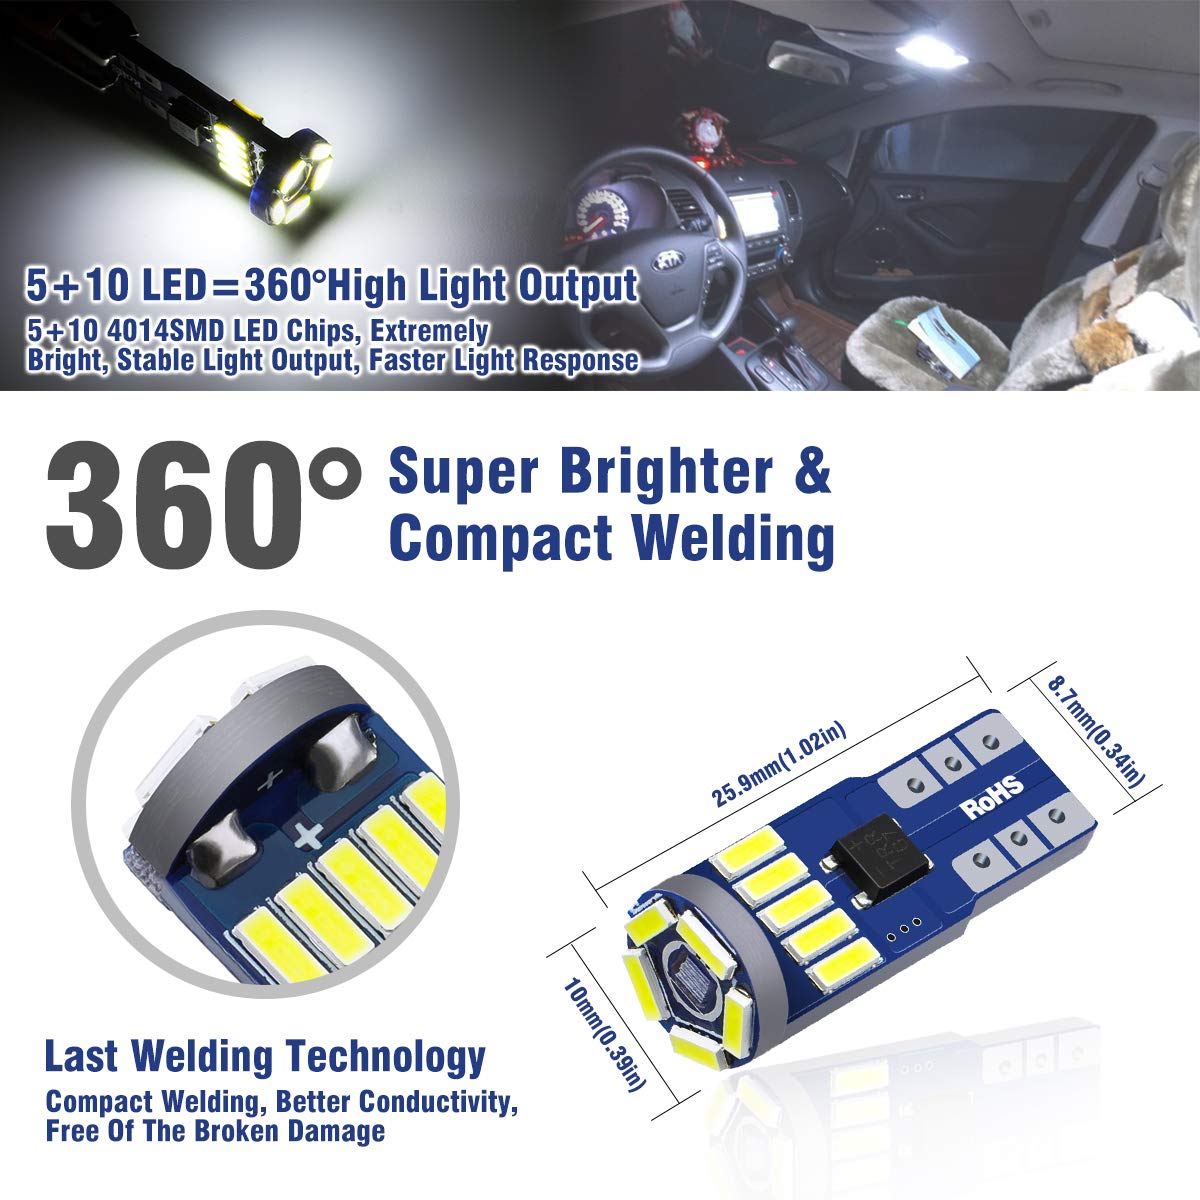 Audew W5W//T10 LED CANBUS Auto Targa Lampade 15 x 4014 SMD LED 12V 6712K Cuneo Tipo Lampadine Per Luce di Indicatore Laterale 10Pcs